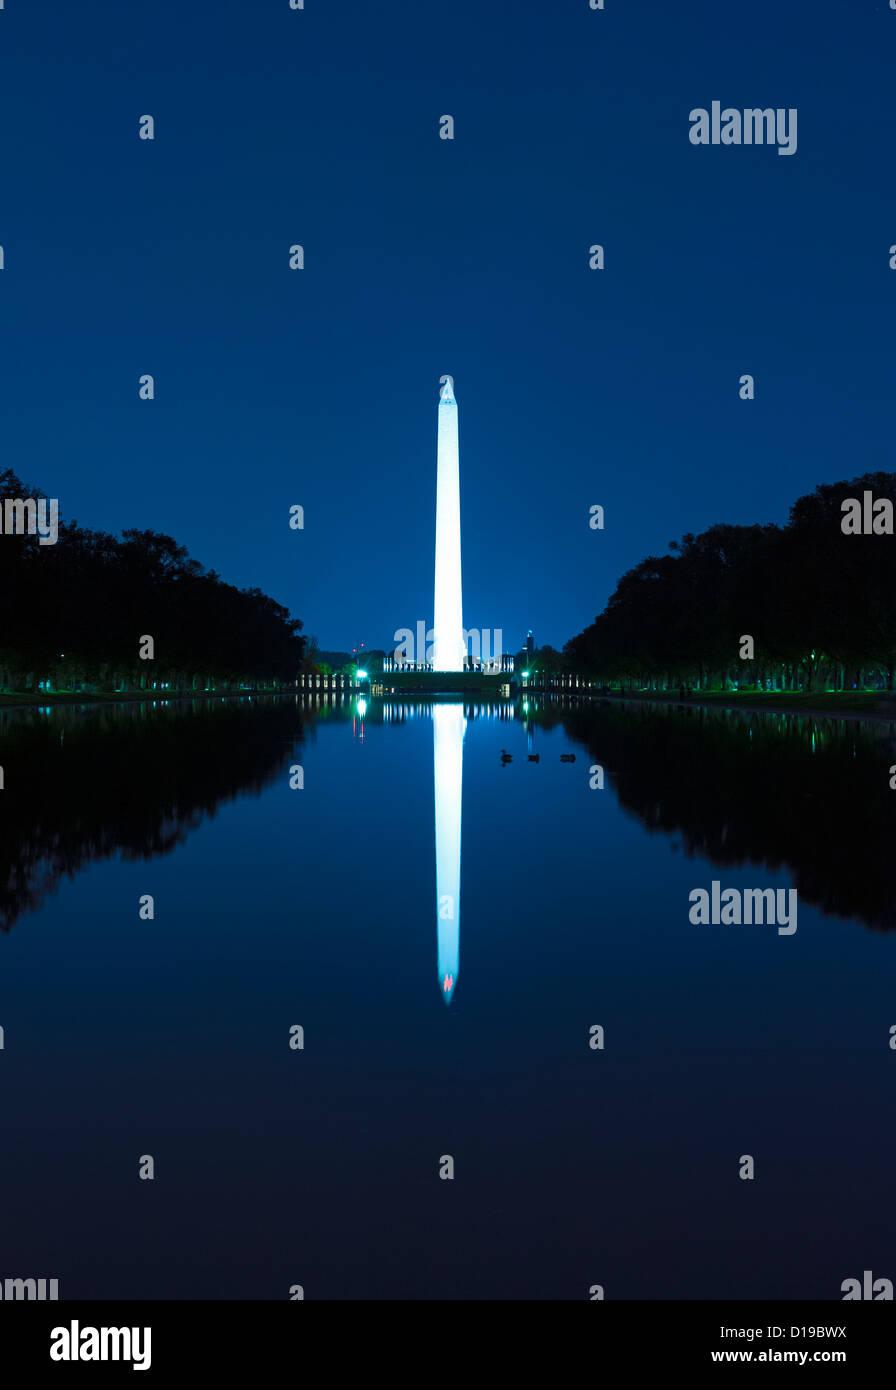 The Washington Monument and reflecting pool at twilight on the National Mall,  Washington DC - Stock Image